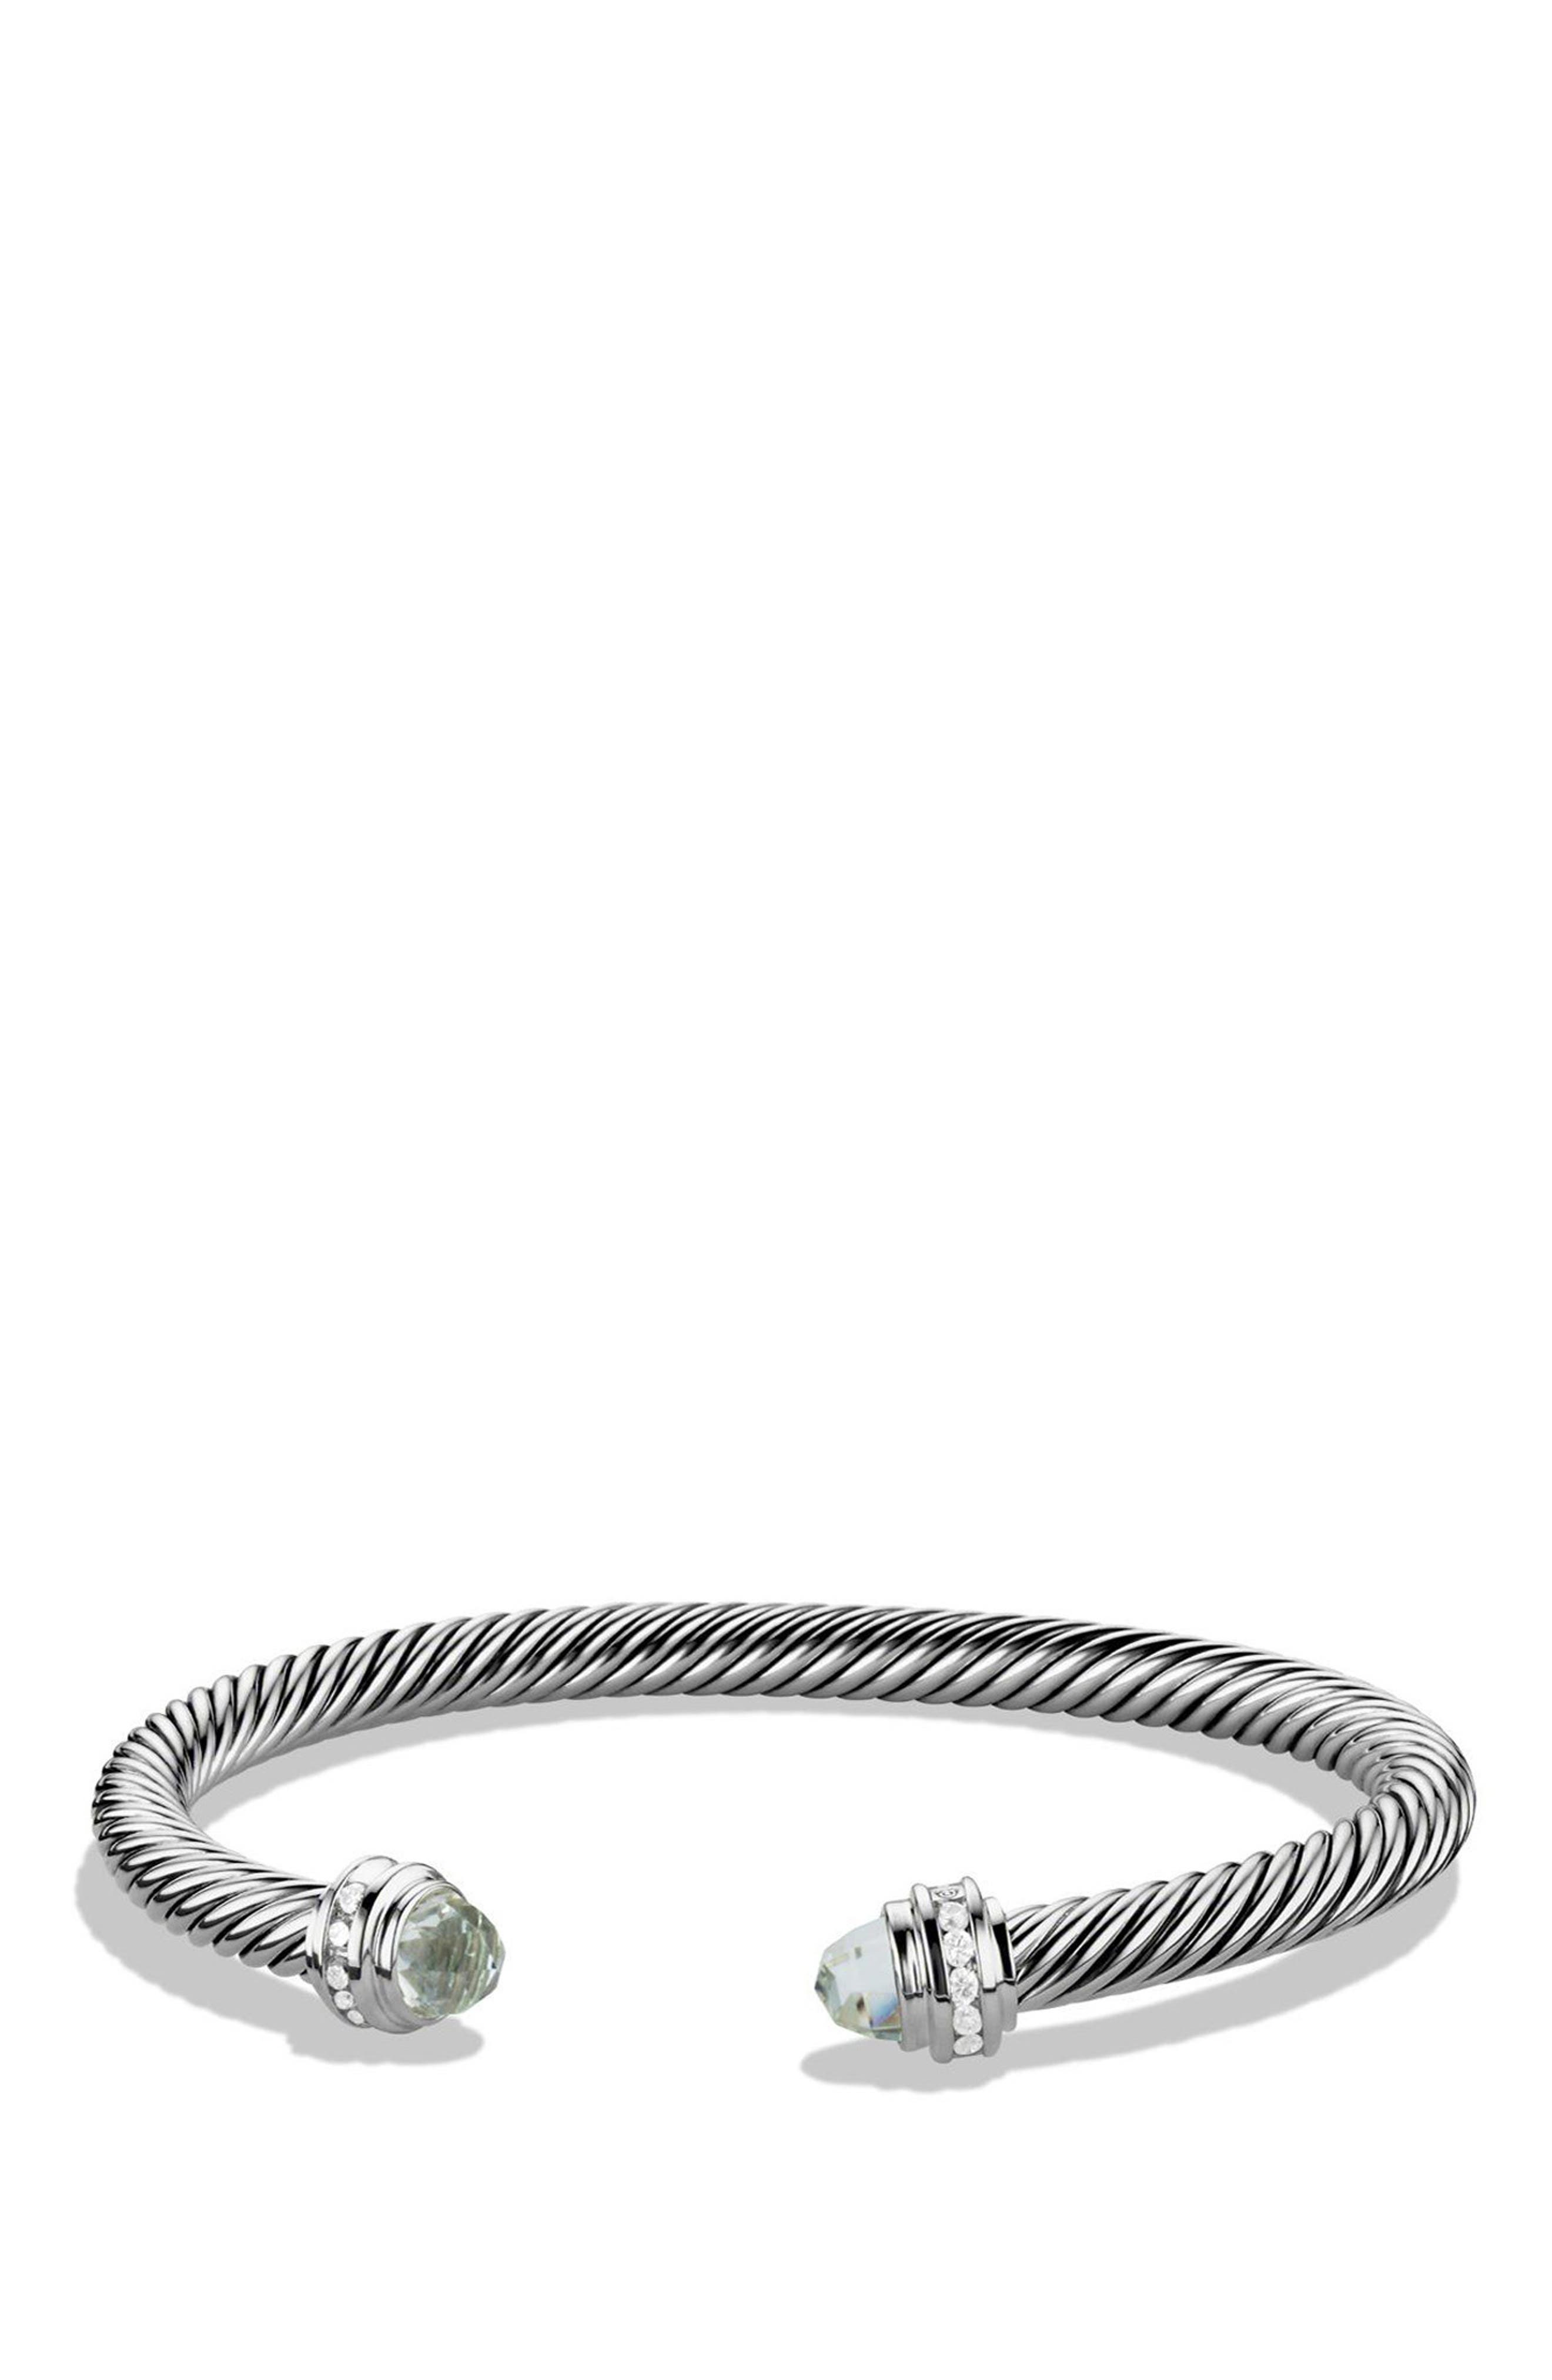 Cable Classics Bracelet with Semiprecious Stones & Diamonds, 5mm,                             Main thumbnail 1, color,                             PRASIOLITE